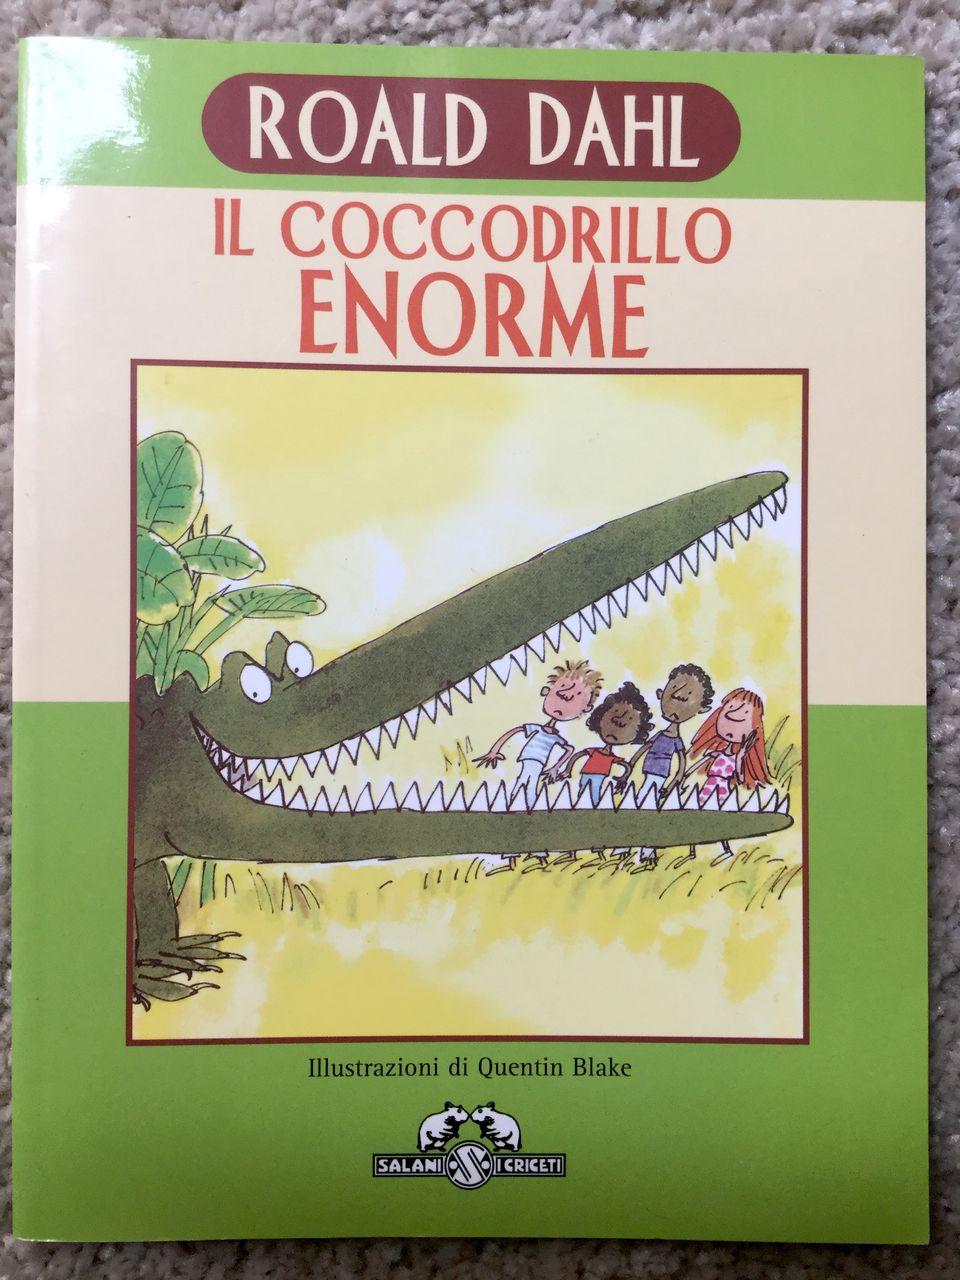 Roald Dahl, Il coccodrillo enorme, Salani